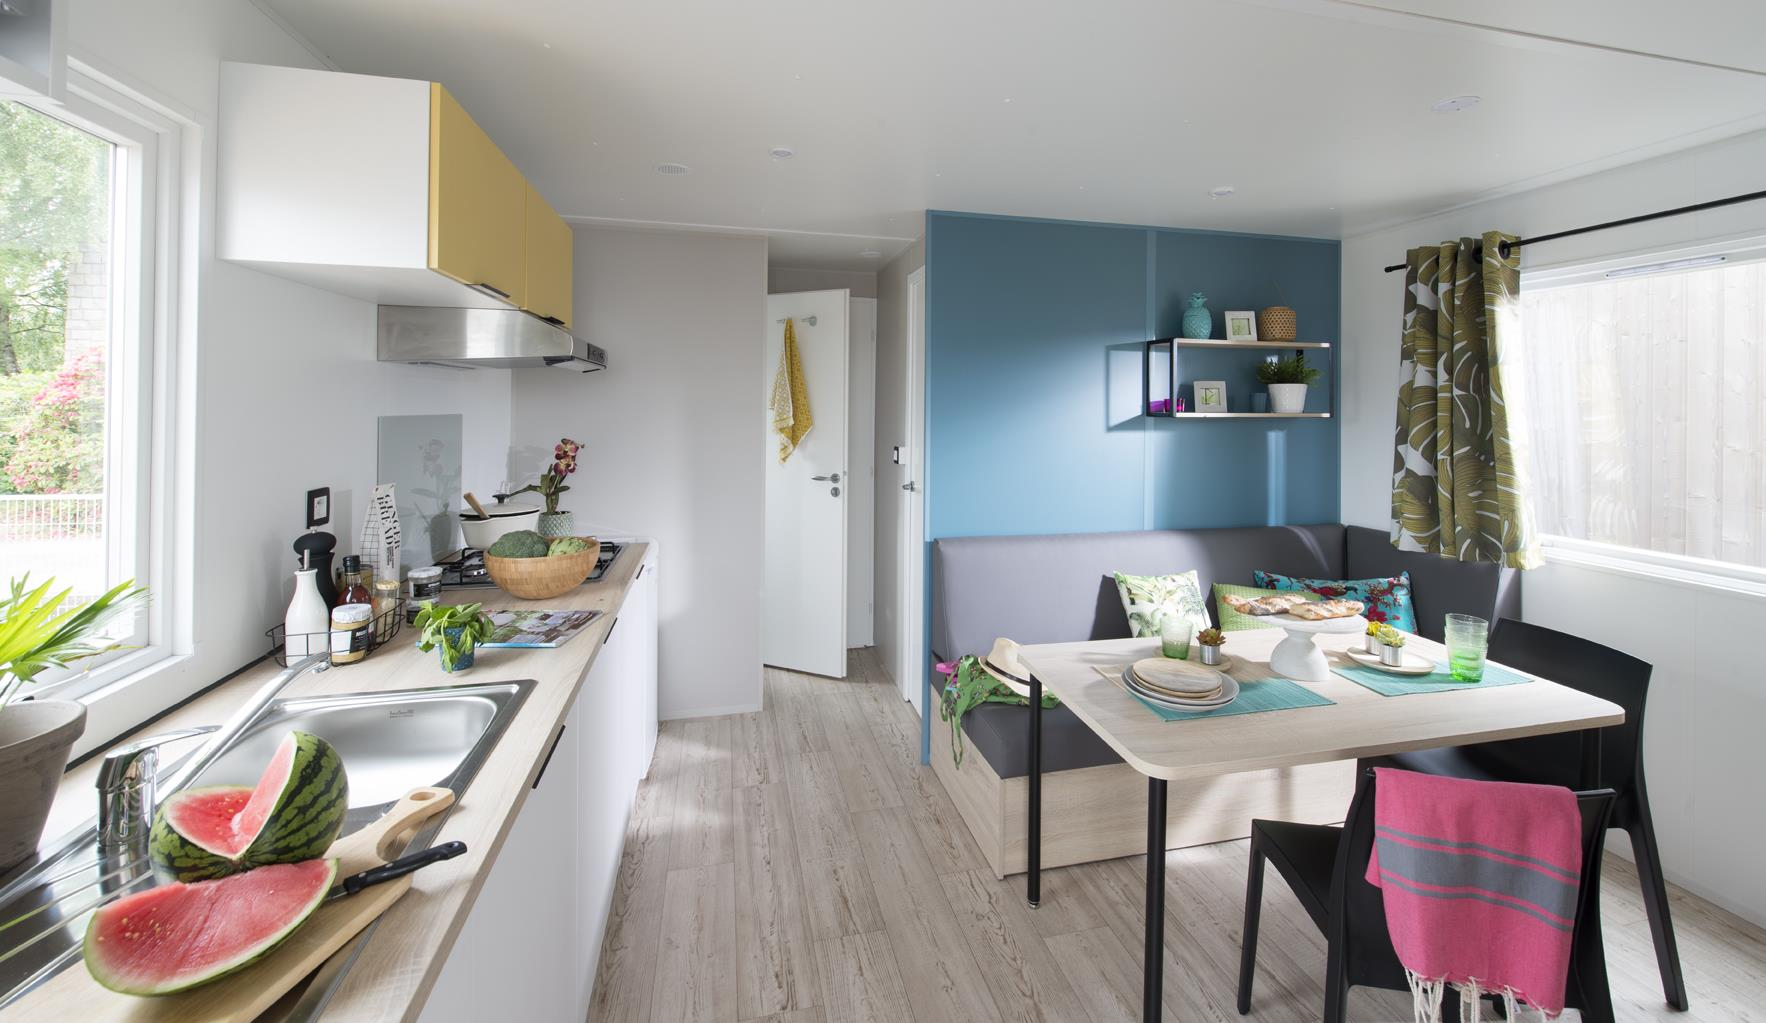 Location - Mobil Home Ciela Family - 25M² - 2 Chambres 4+1 (Enfant) - Camping Les Marsouins